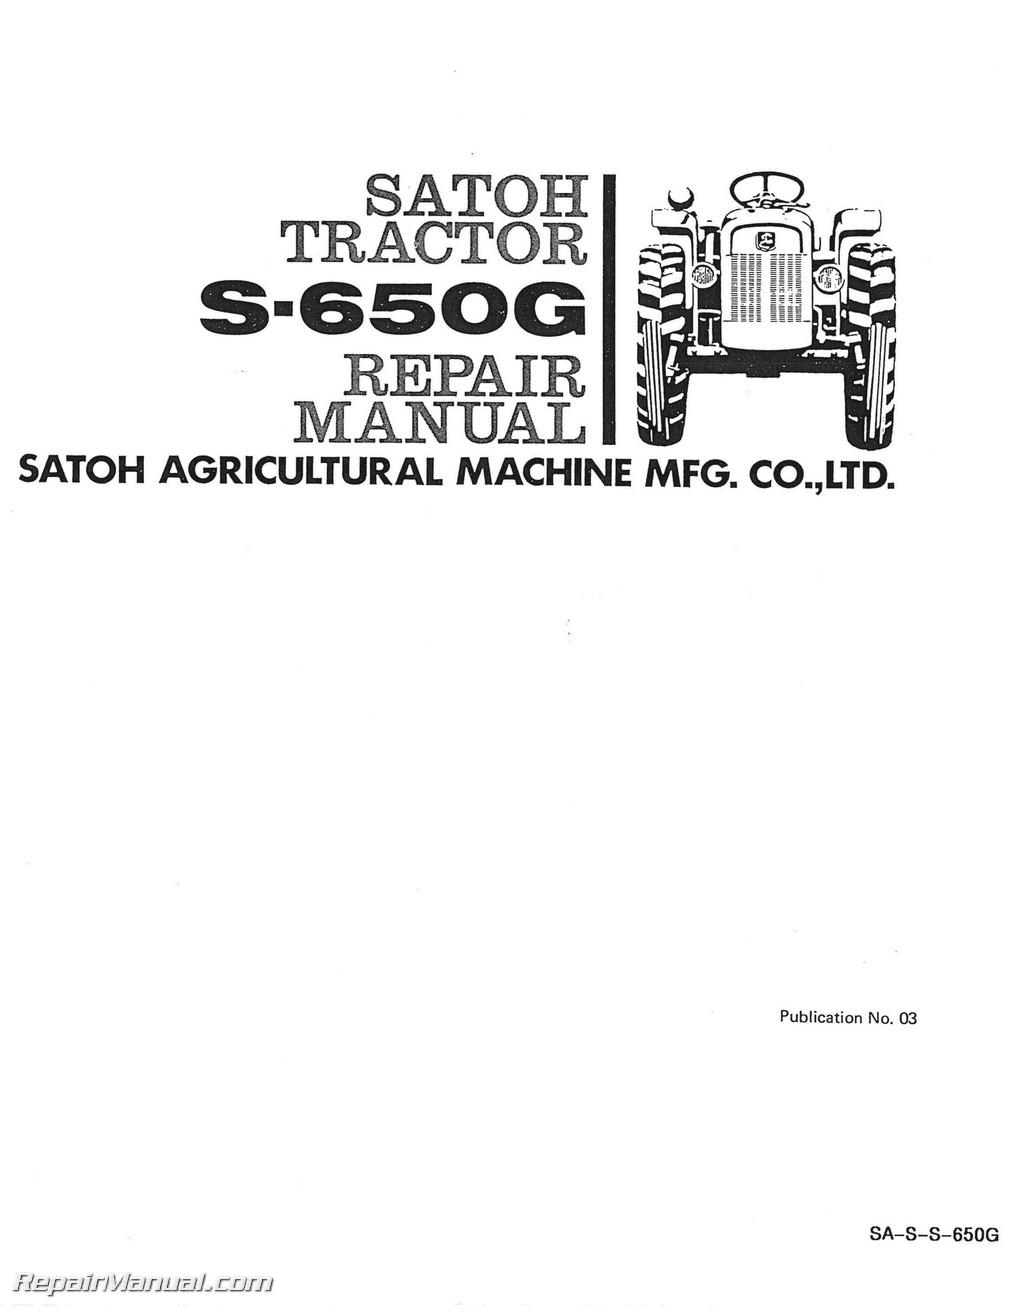 Satoh S650g Tractor Service Manual